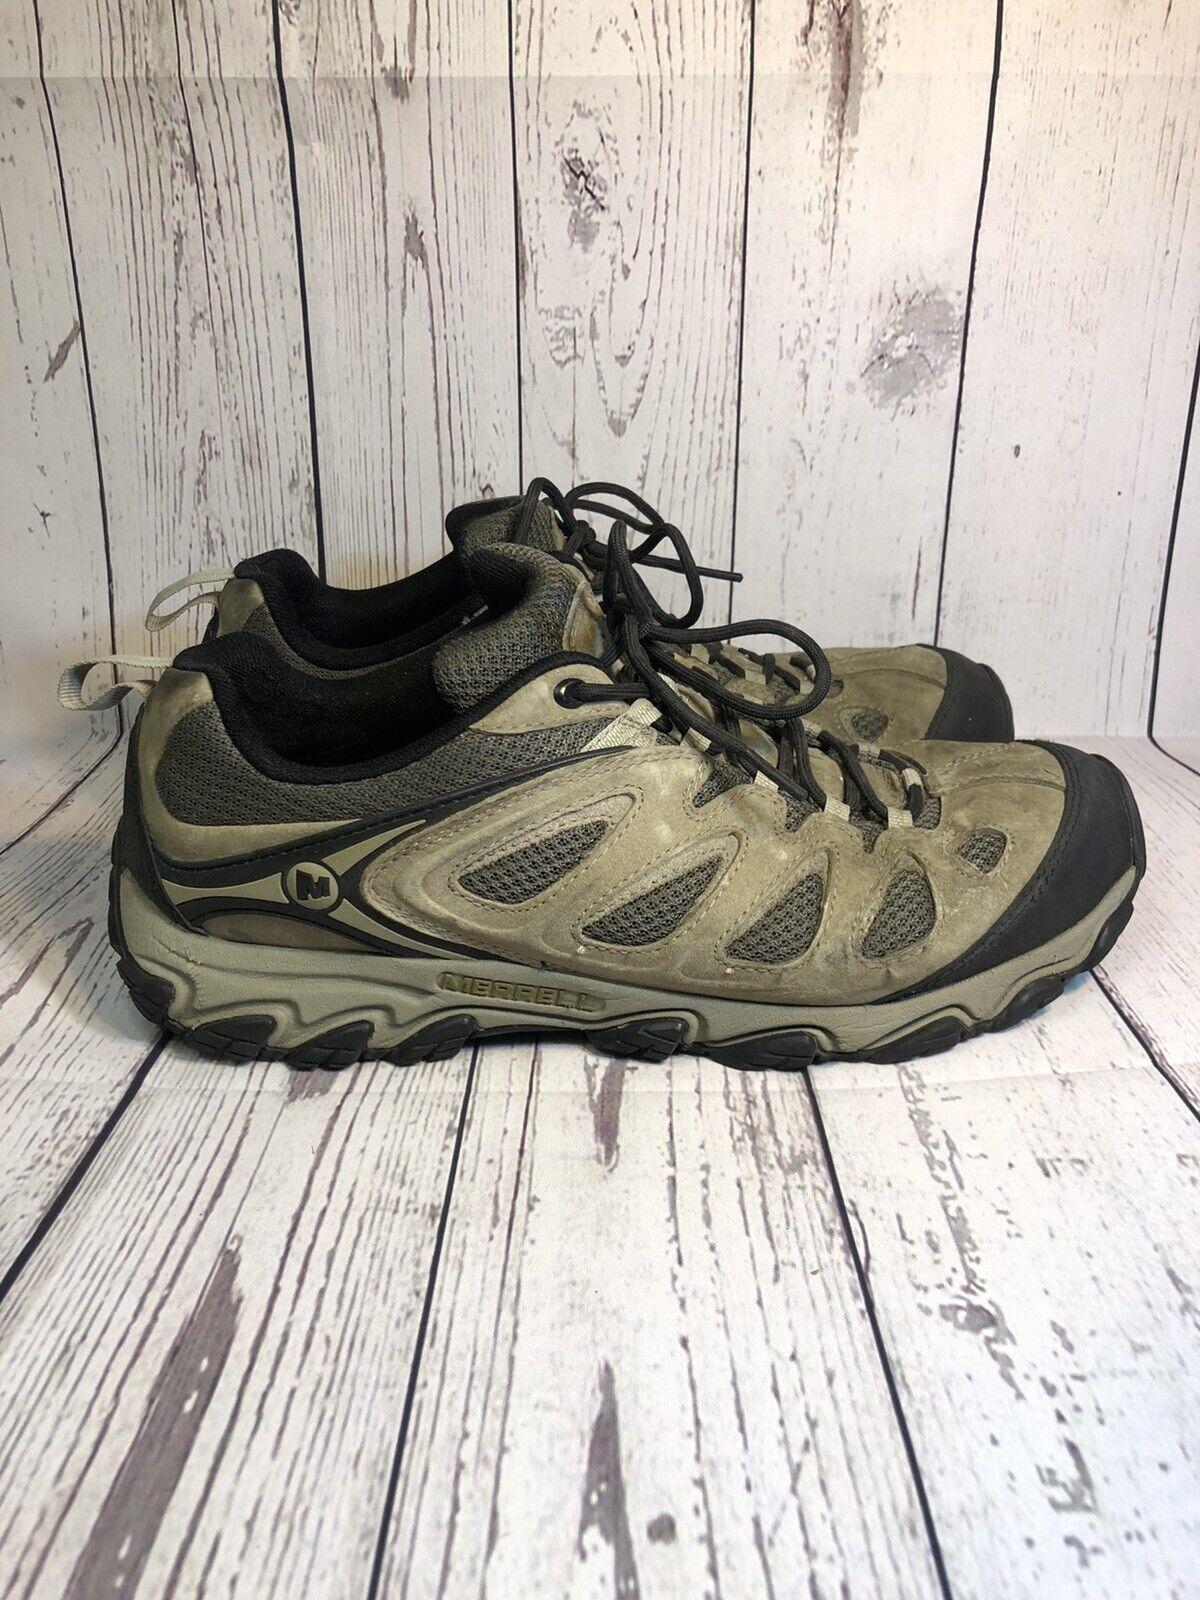 Merrell Pulsate Ventilator Hiking Shoes J599965 Walking Shoes Mens Size 12